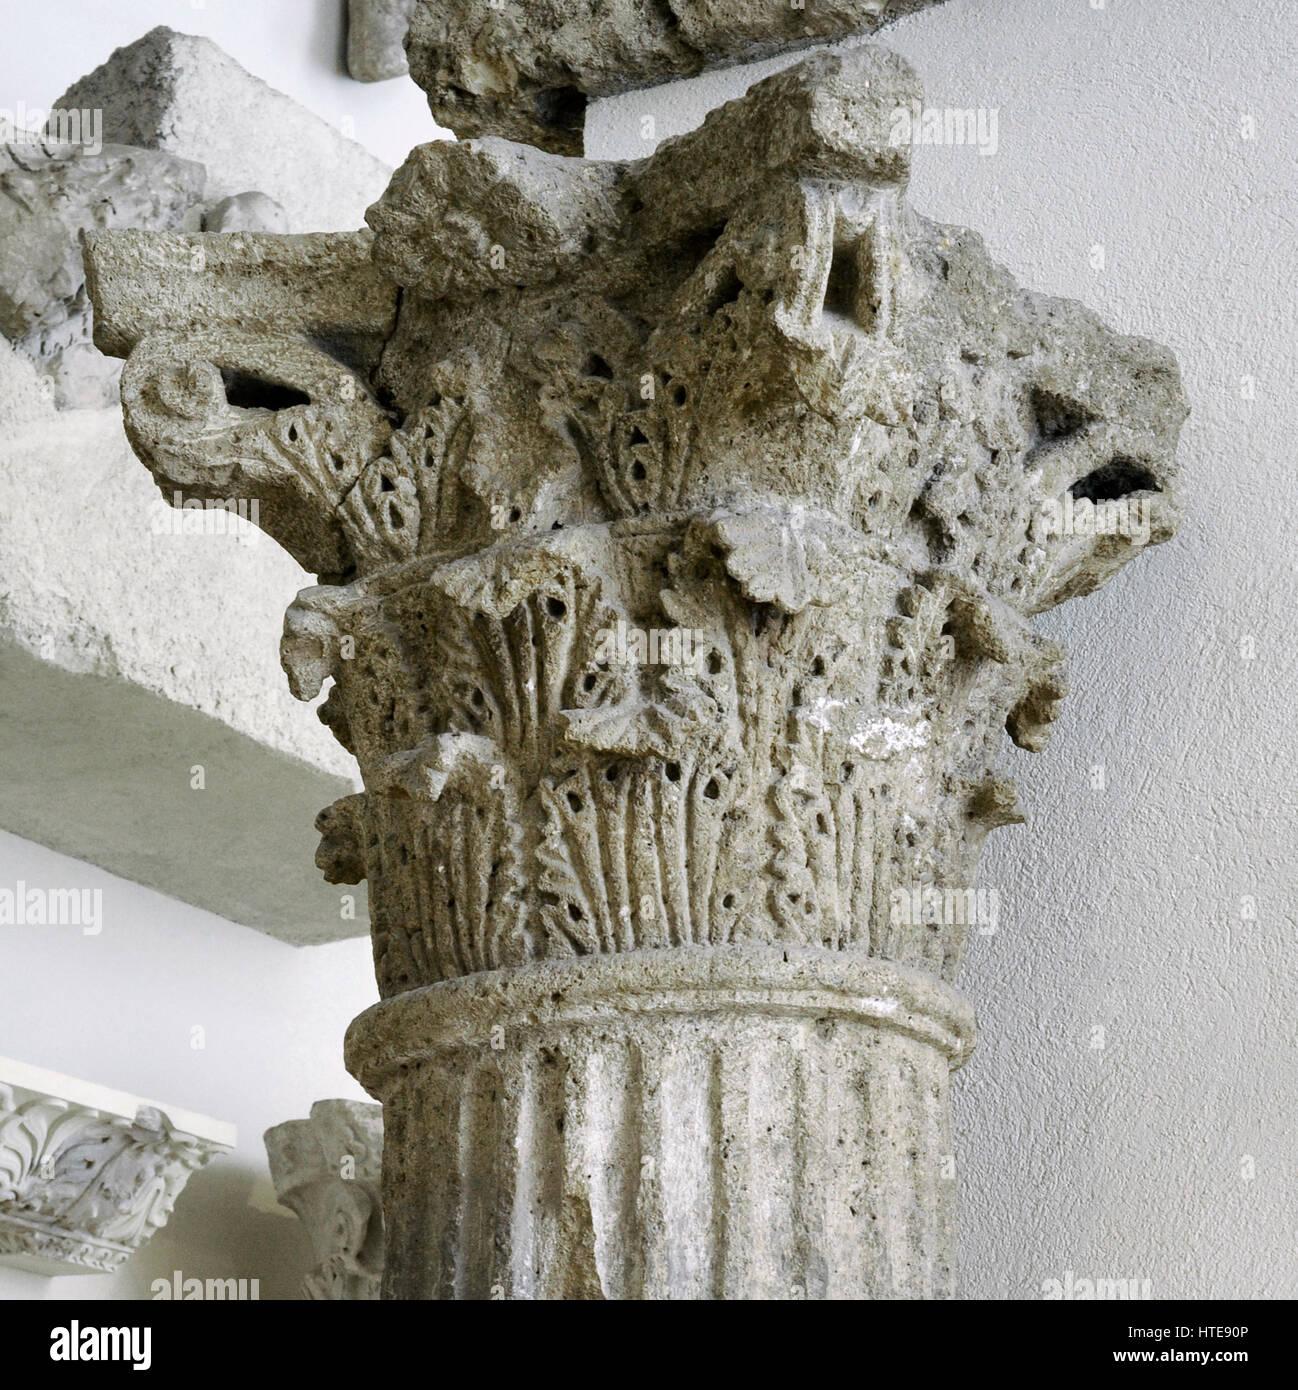 Corinthian capital decorated with acanthus leaves. Roman theatre. 1st century AD. Stone of Medol/Soldo. Tarragona, - Stock Image